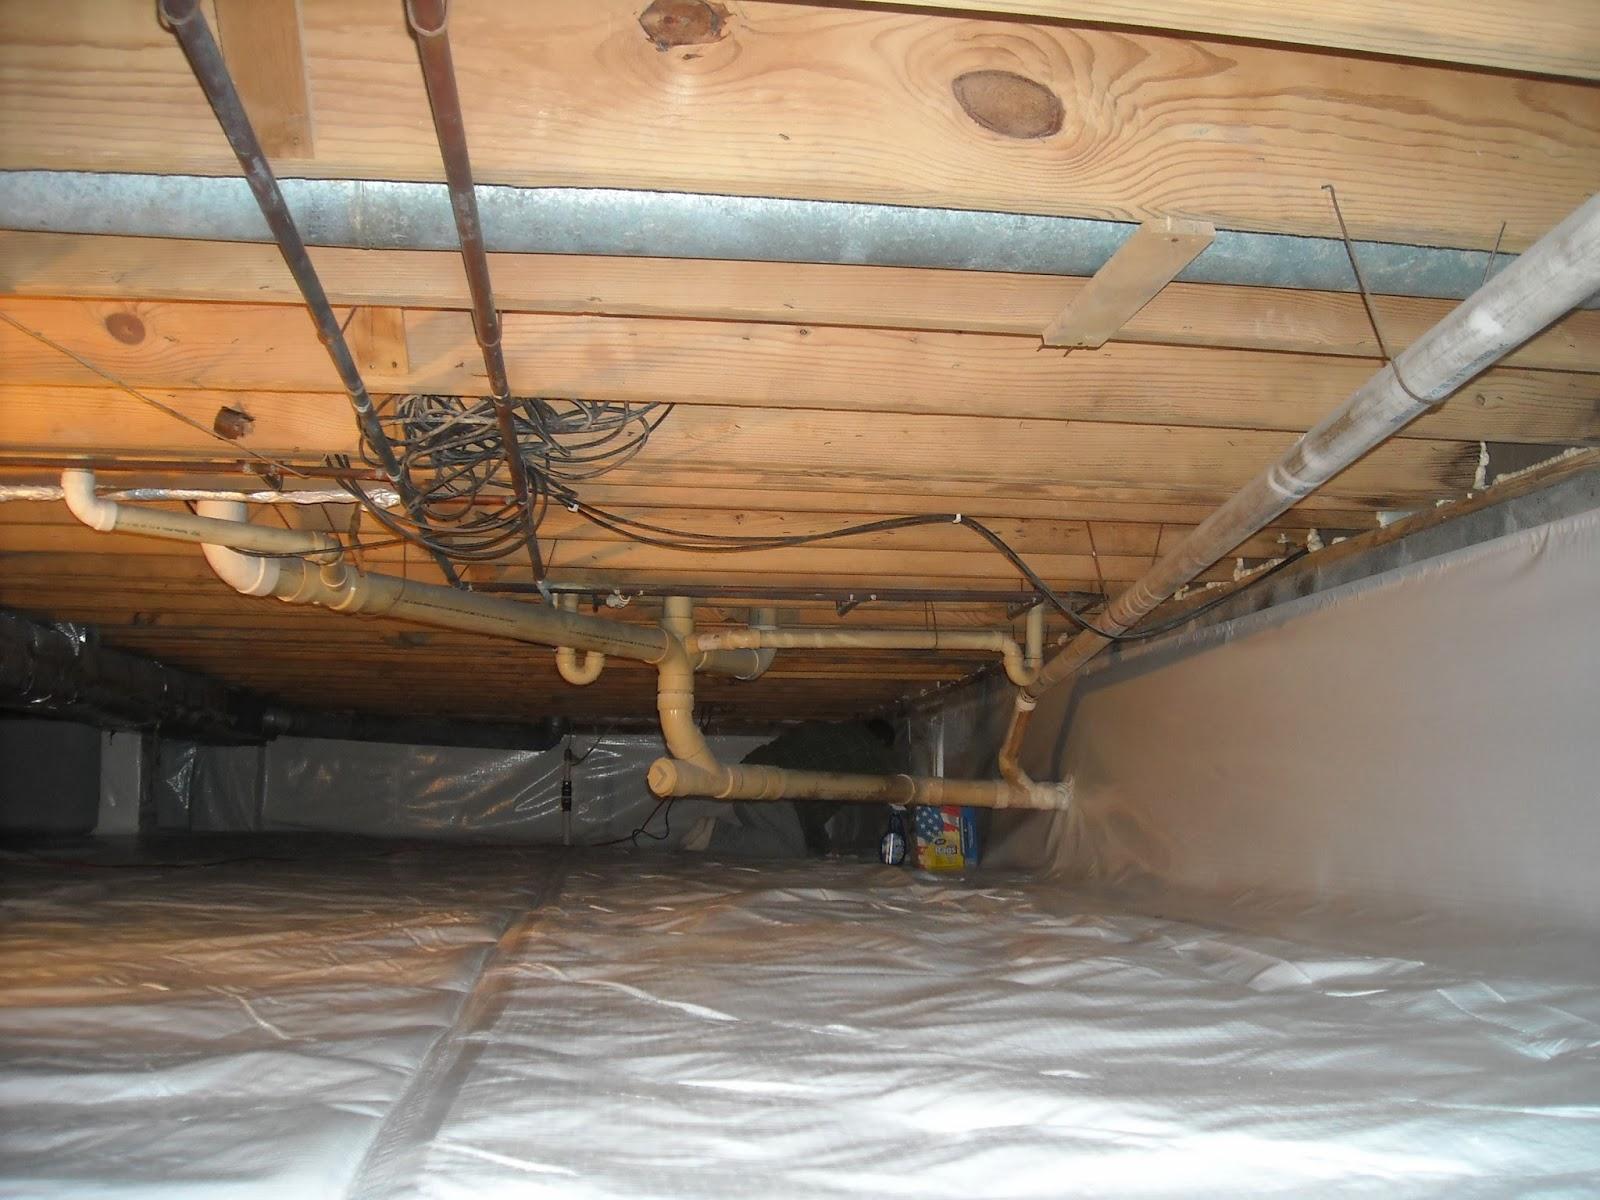 Crawl Space Insulation : Indiana crawlspace repair and waterproofing november